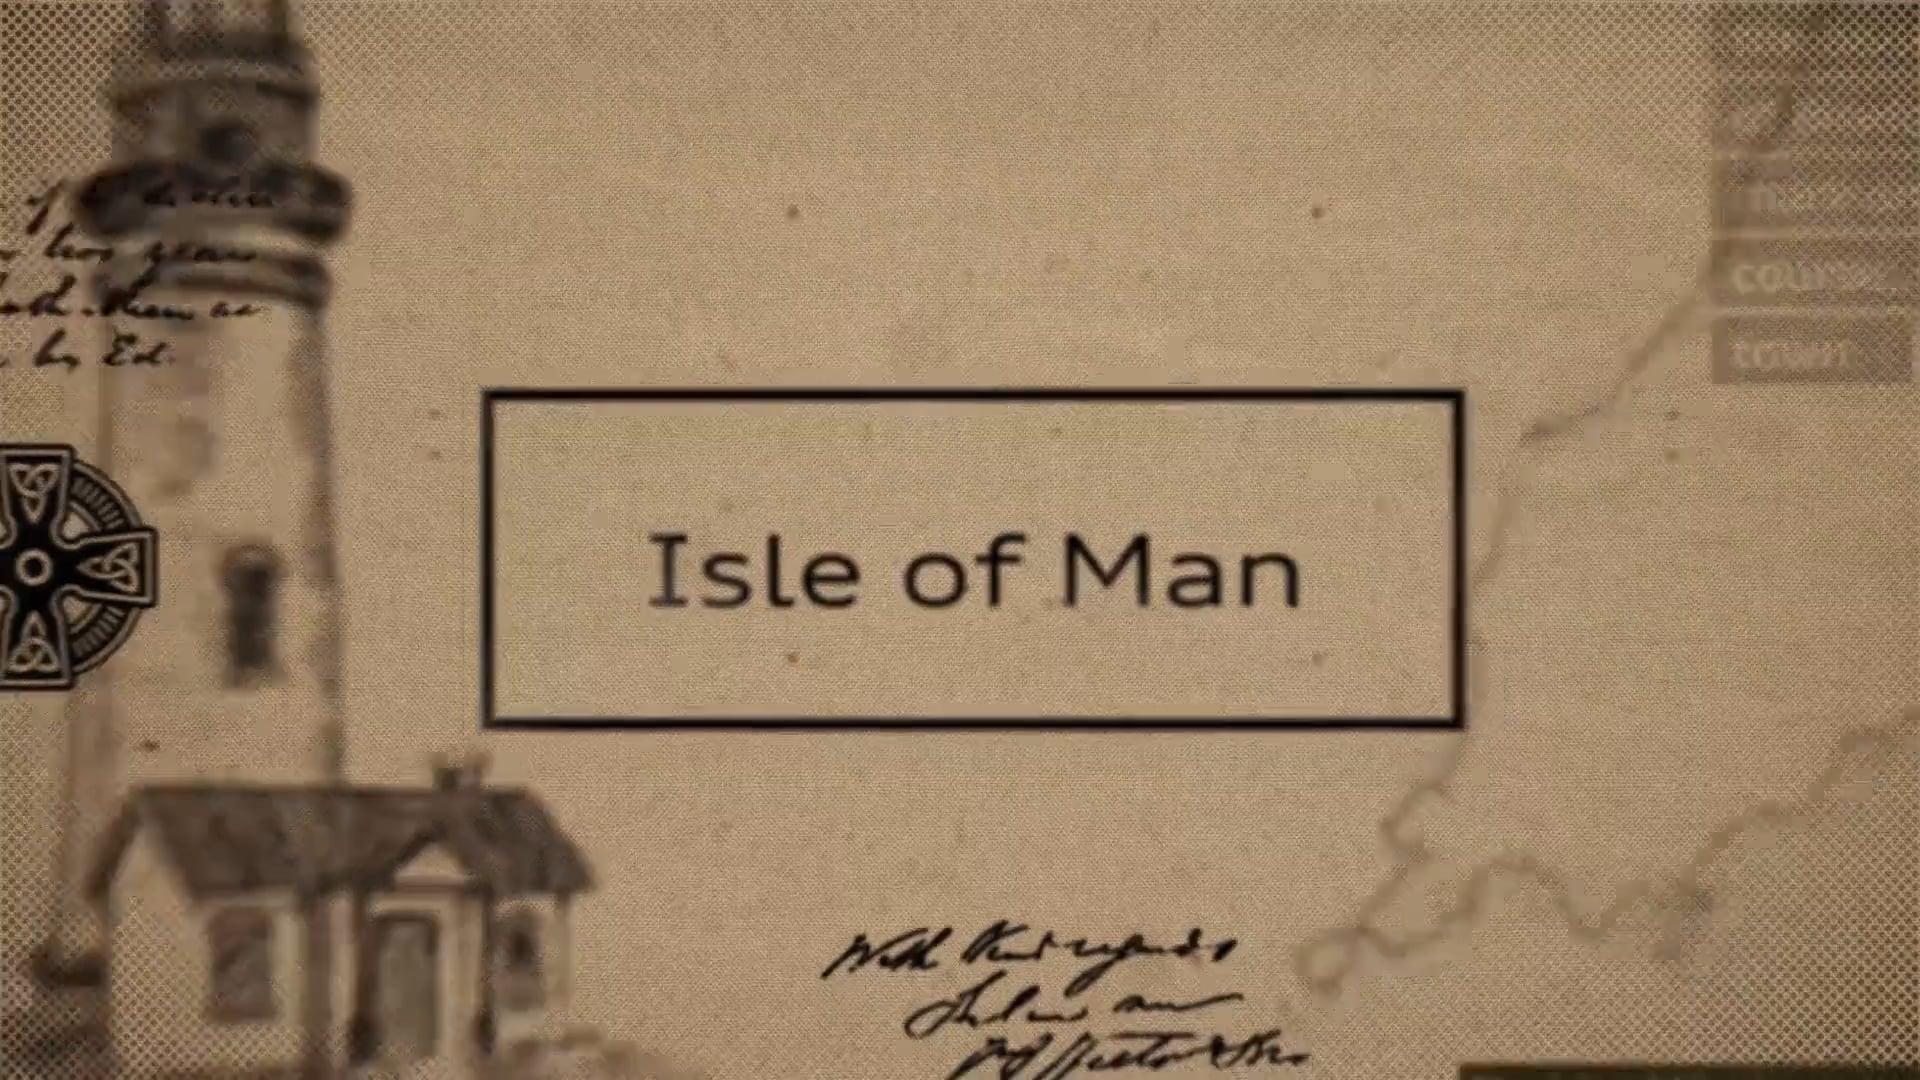 Audi - Isle of man TT